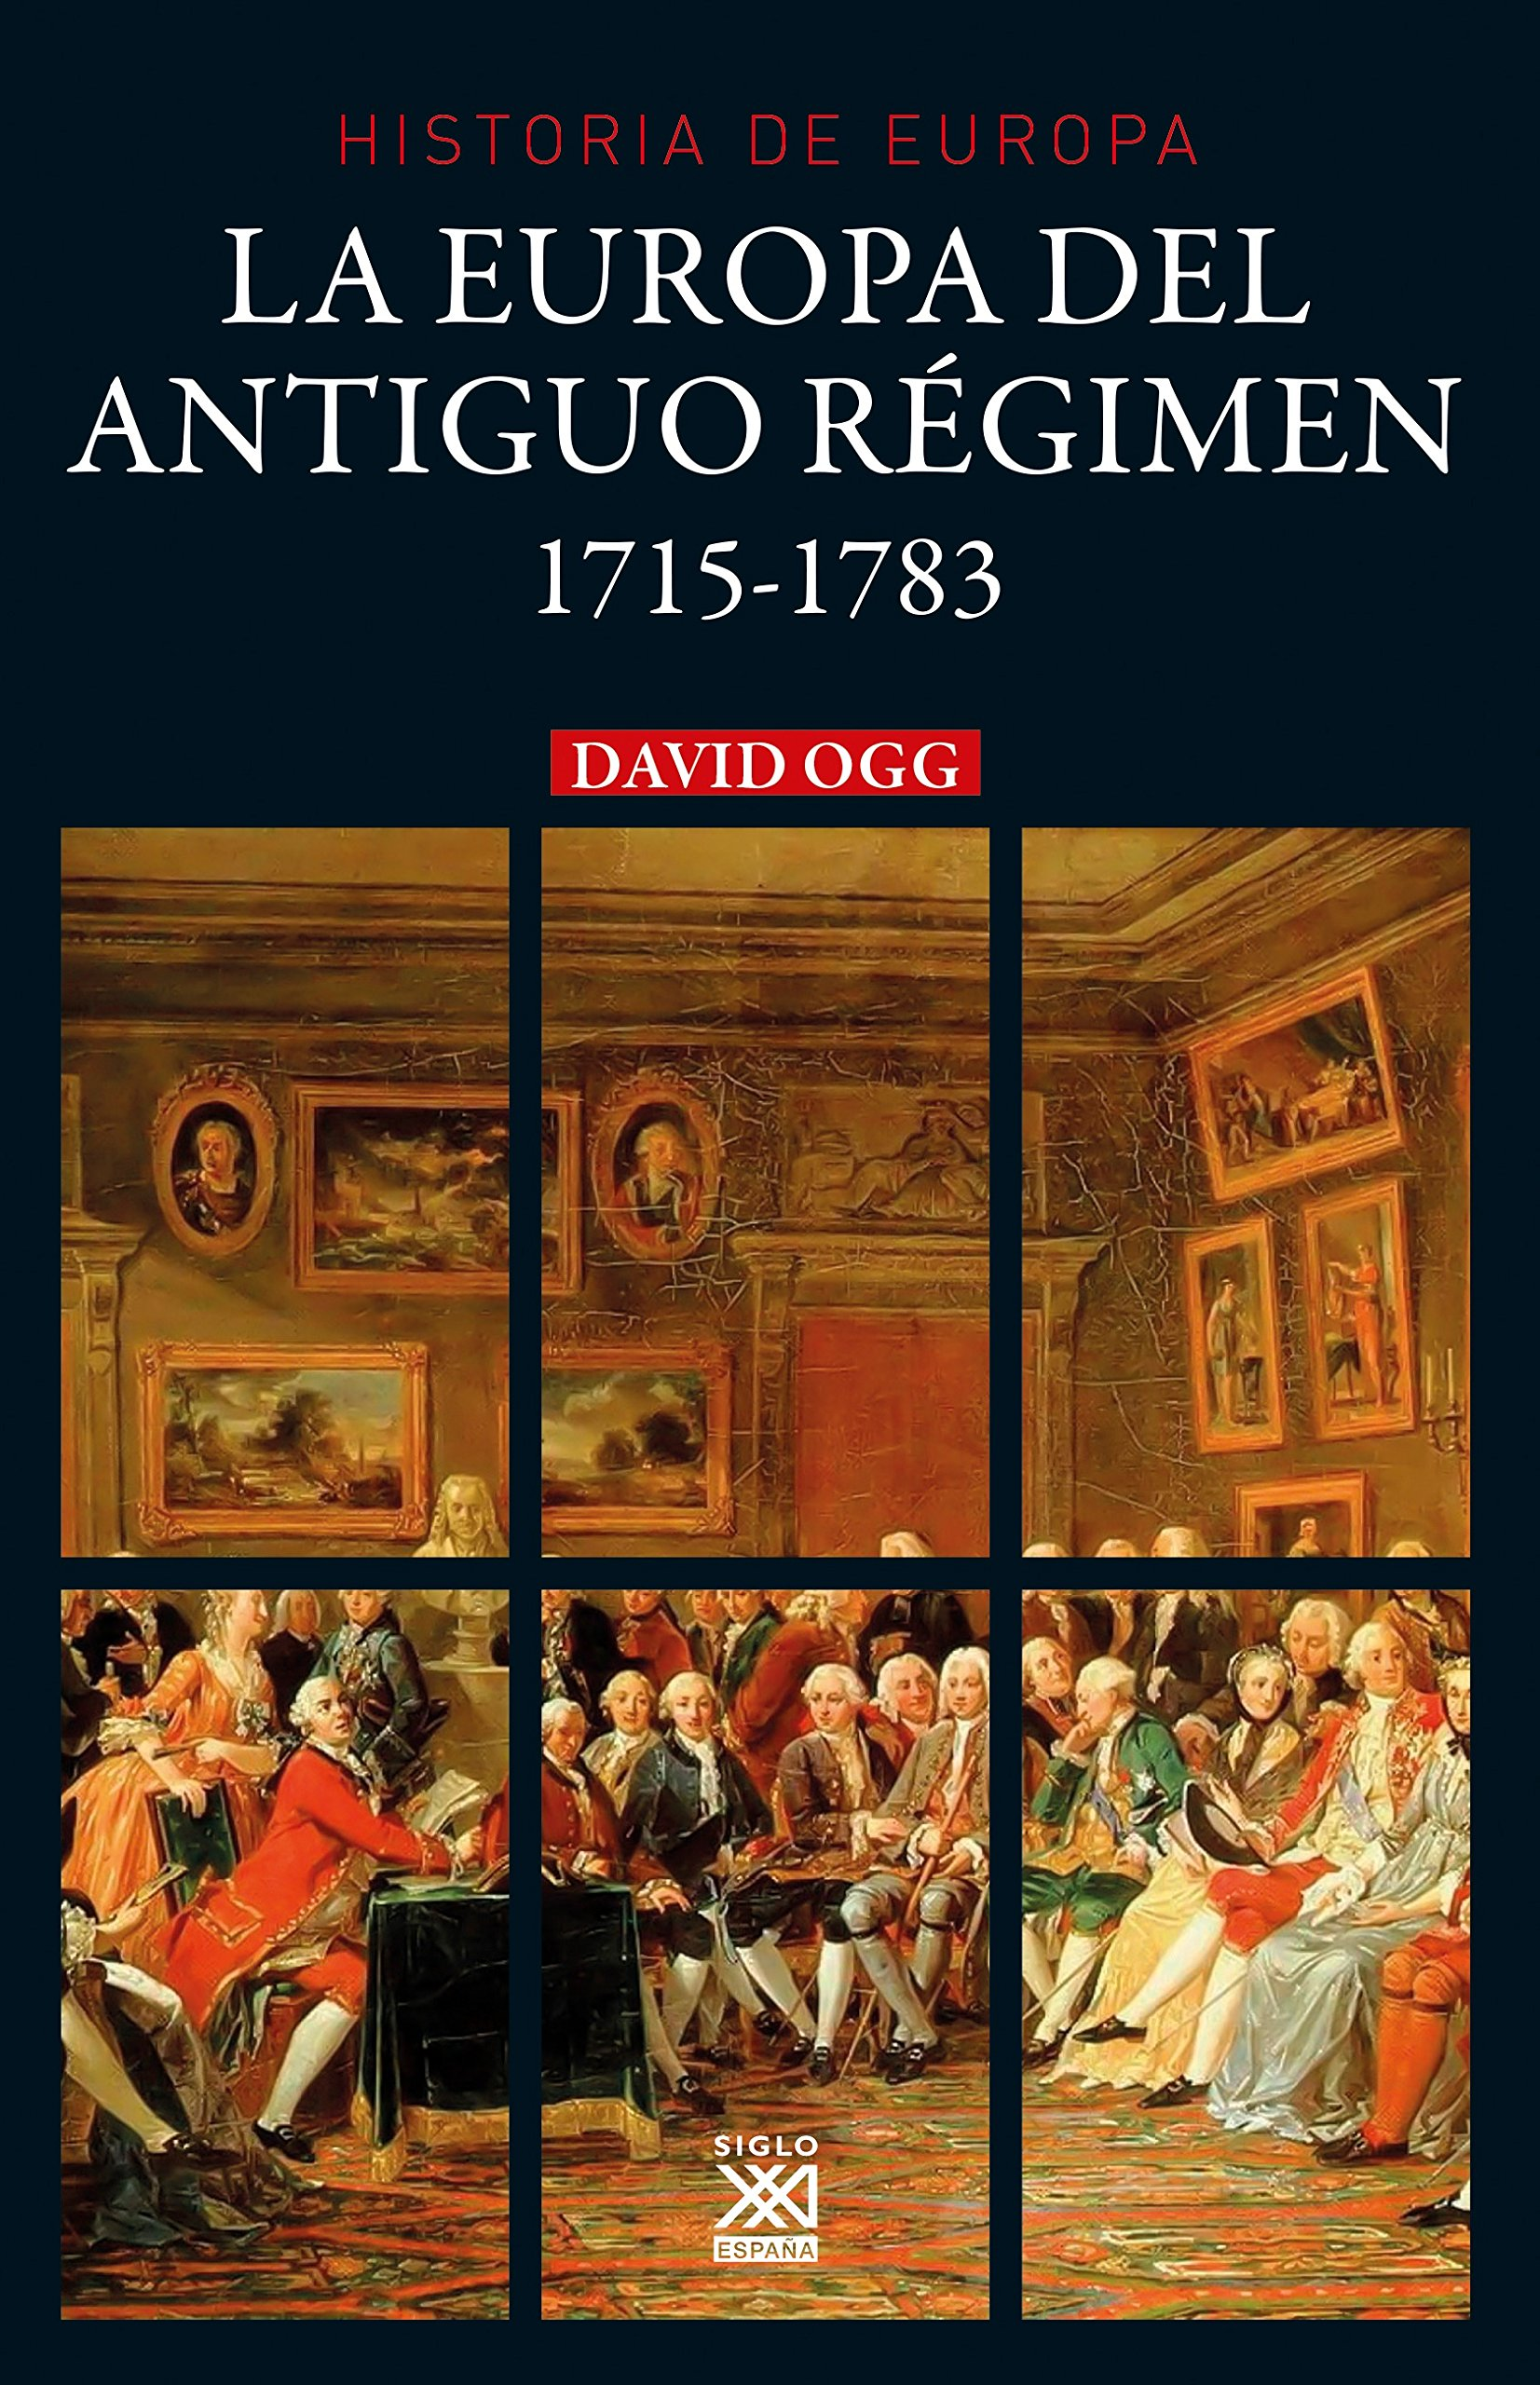 La Europa del Antiguo Régimen. 1715-1783 Historia de Europa ...